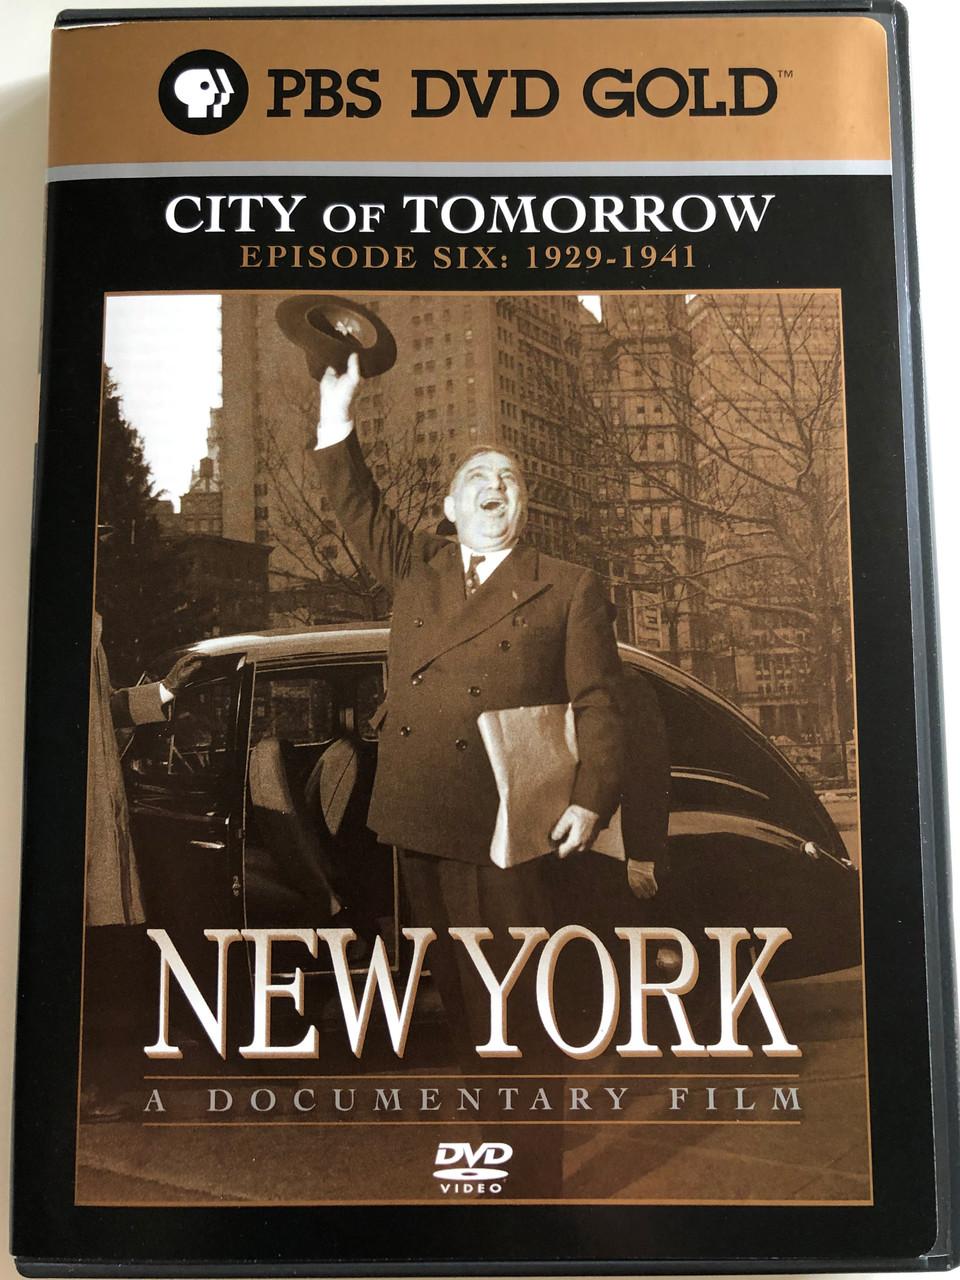 Episode 6: City Of Tomorrow 1929 To 1941 DVD